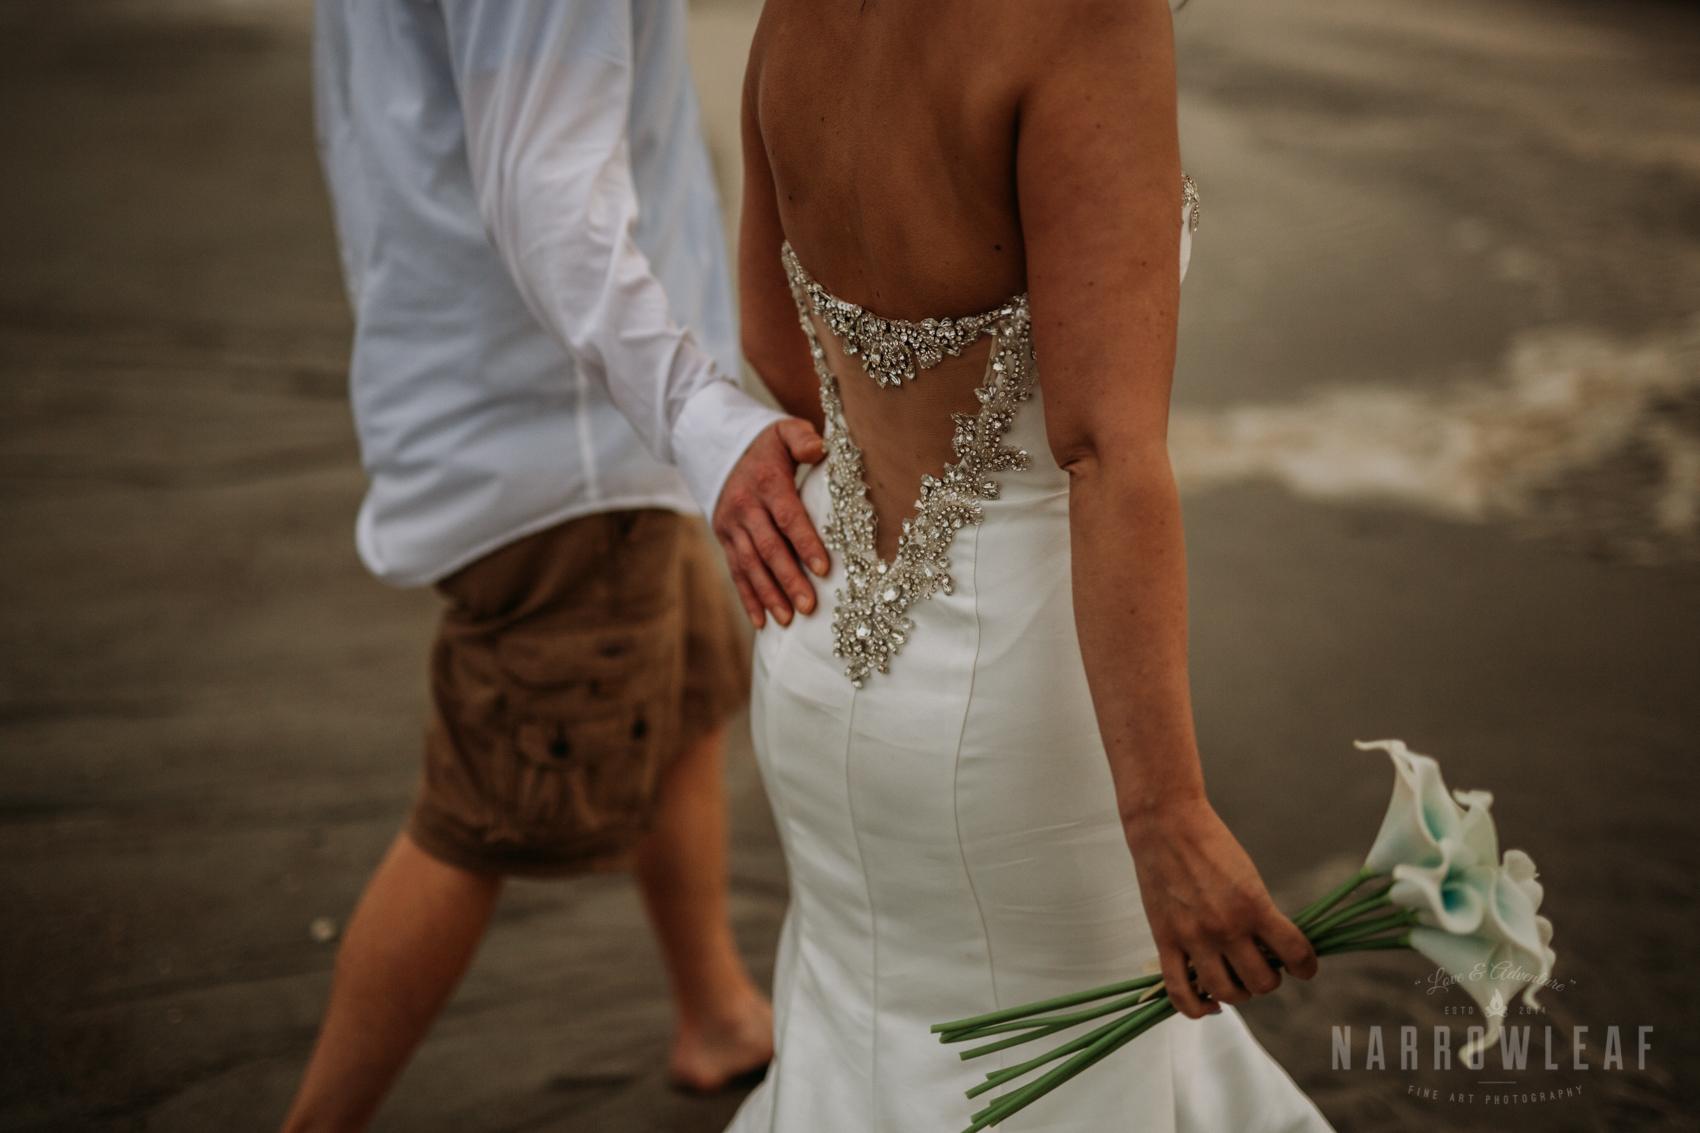 south-carolina-folly-beach-destination-wedding-NarrowLeaf_Love_&_Adventure_Photography-2784.jpg